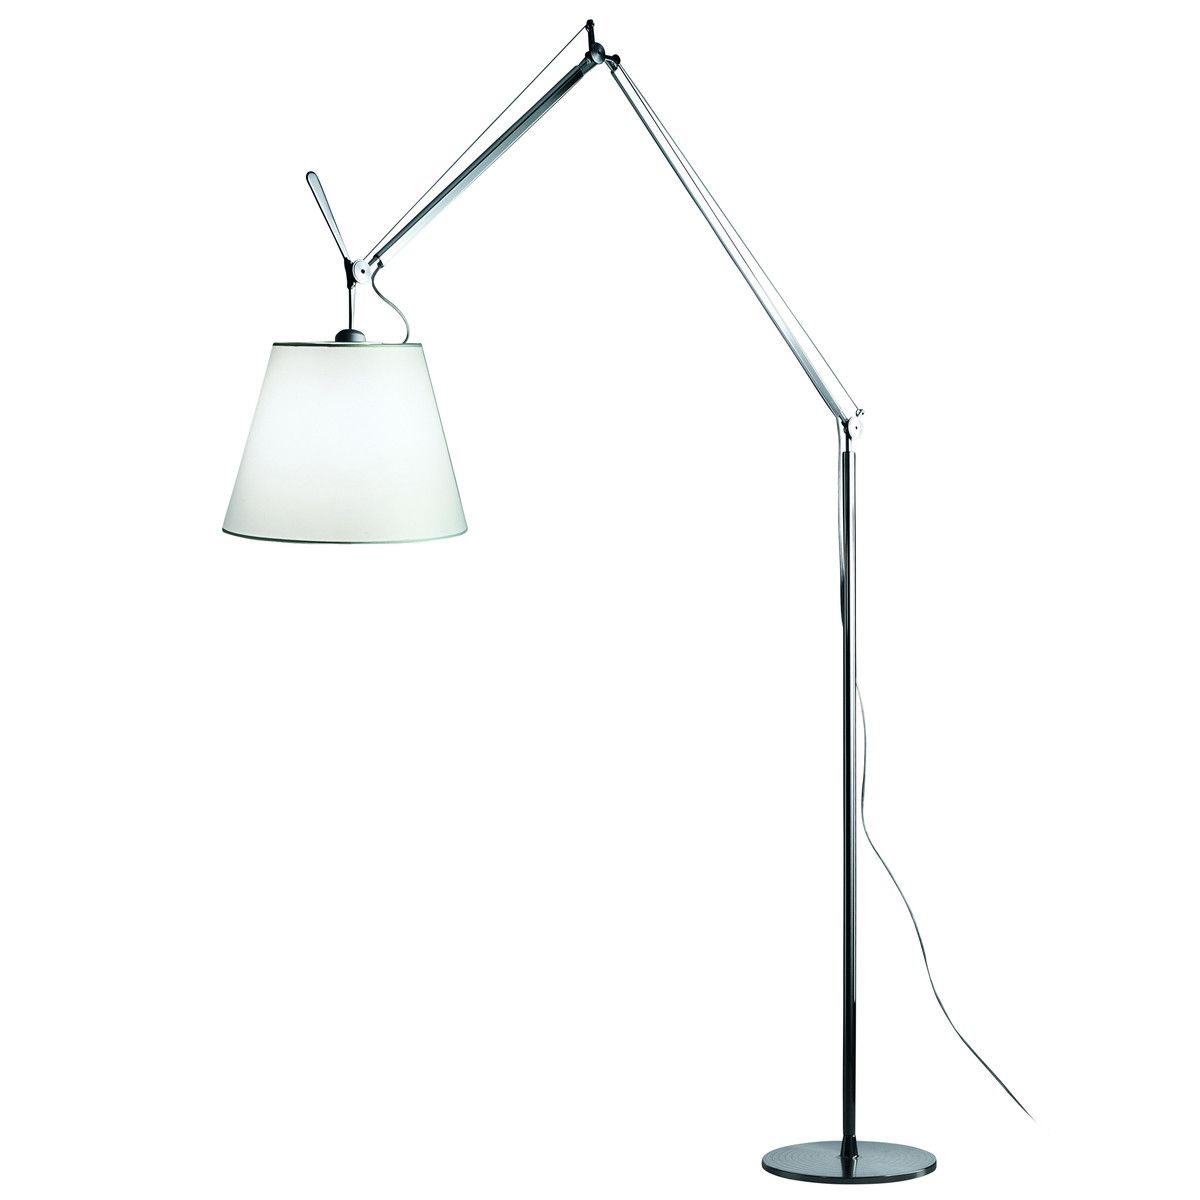 Tolomeo Mega Terra Stehleuchte Von Artemide Contemporary Floor Lamps Floor Lights Lamp